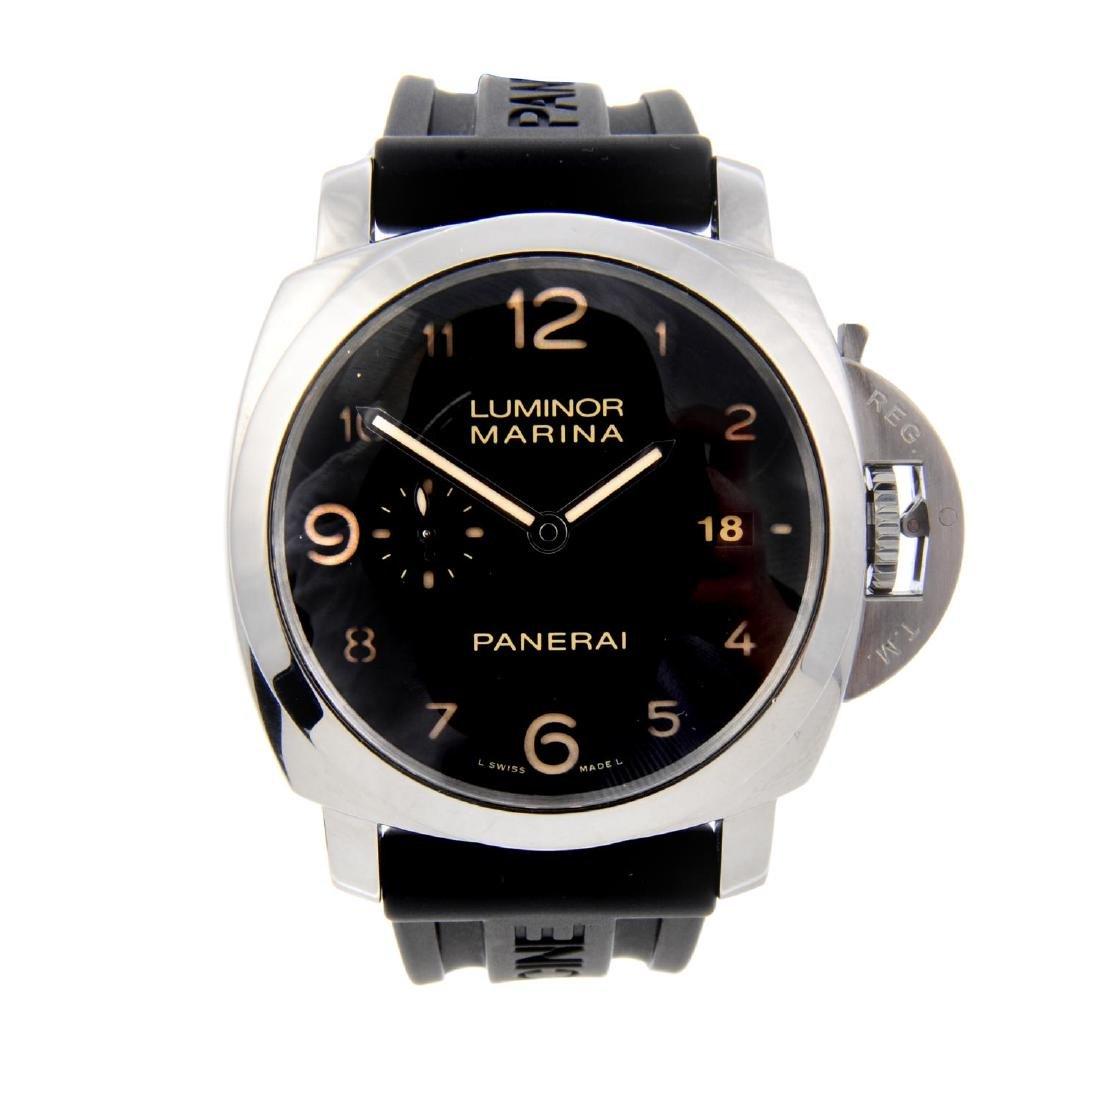 PANERAI - a gentleman's Luminor Marina 1950 wrist